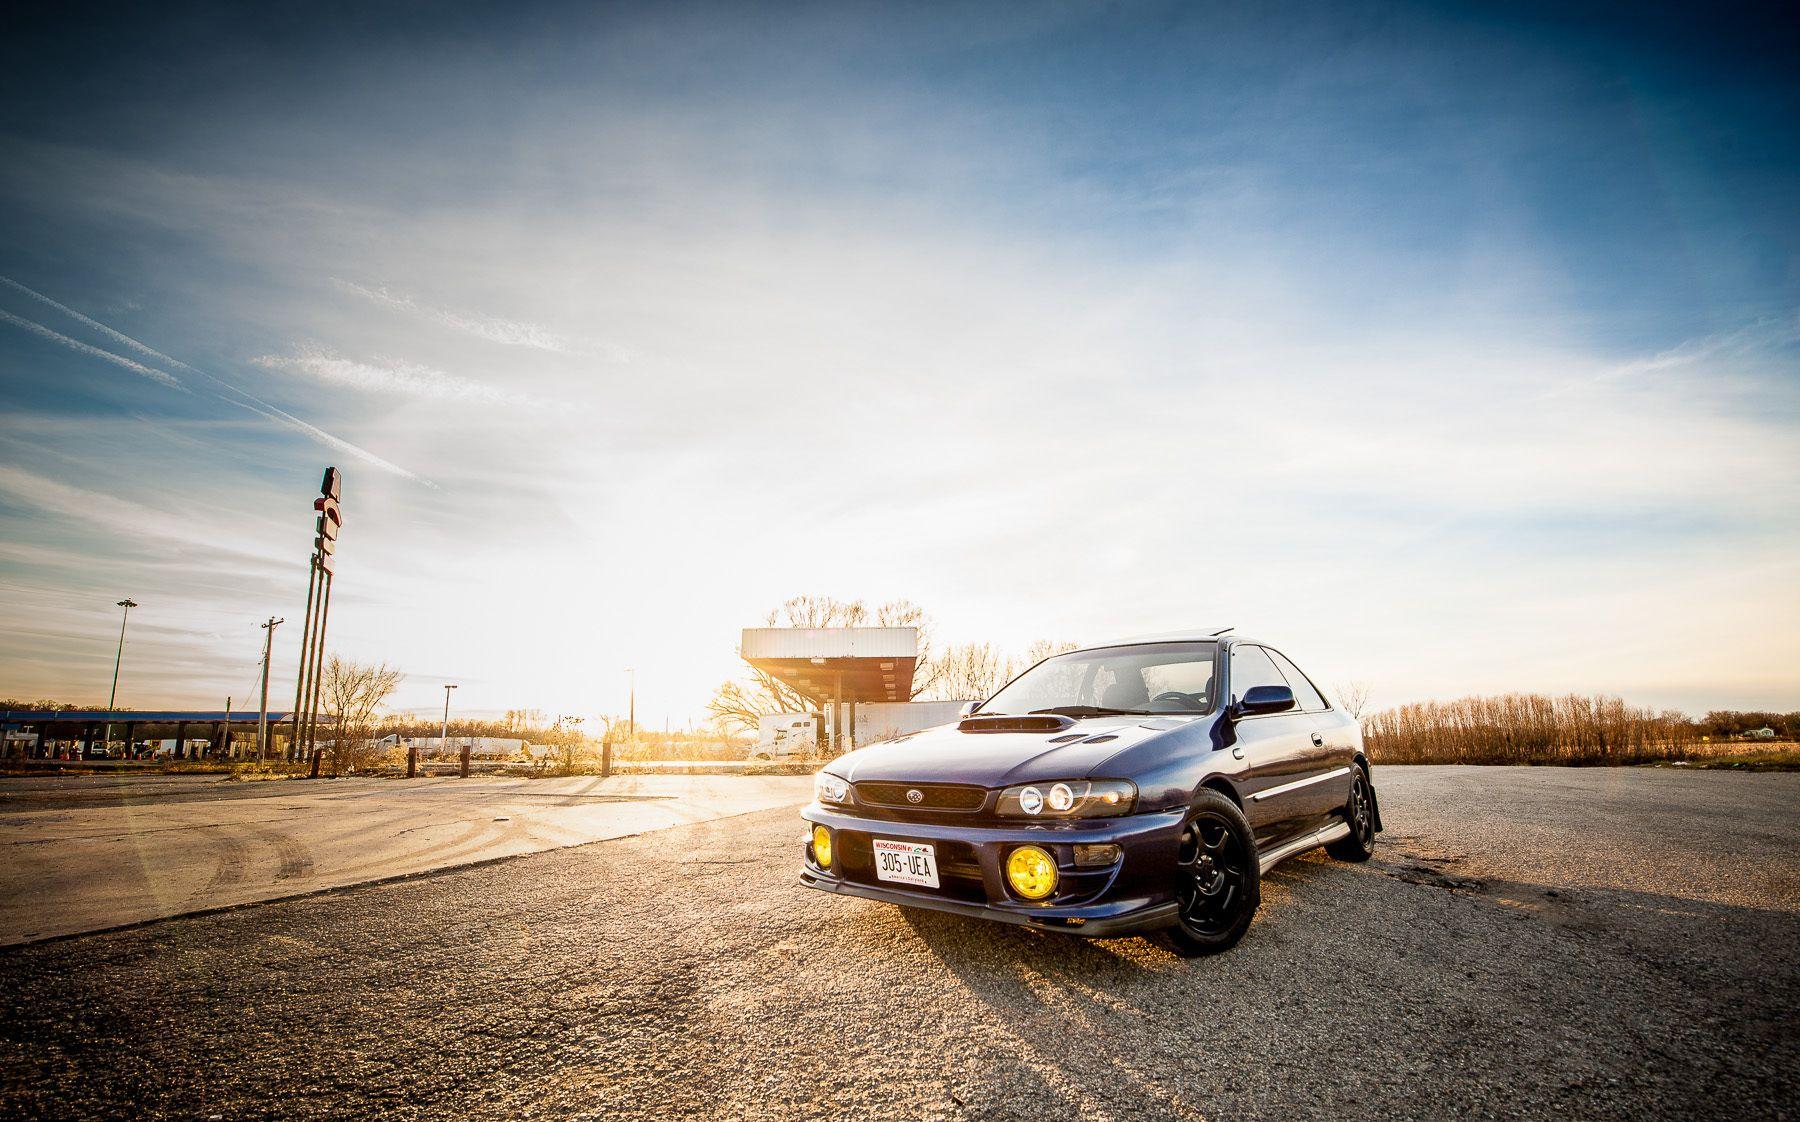 2001 Subaru Impreza 2.5Rs